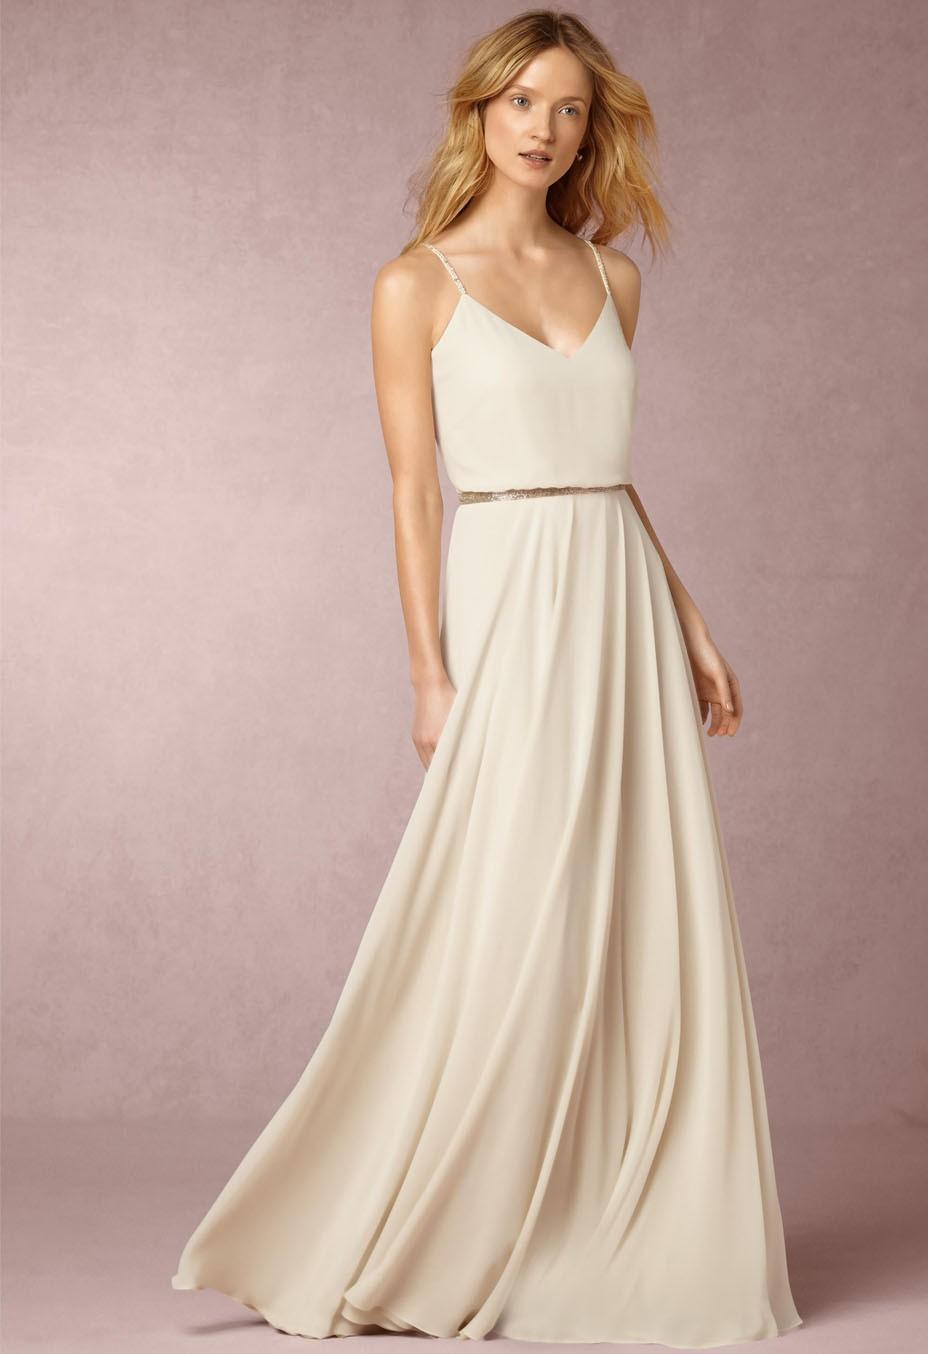 826d2a5c30ebd Jenny Yoo Inesse New Wedding Dress on Sale - Stillwhite Australia